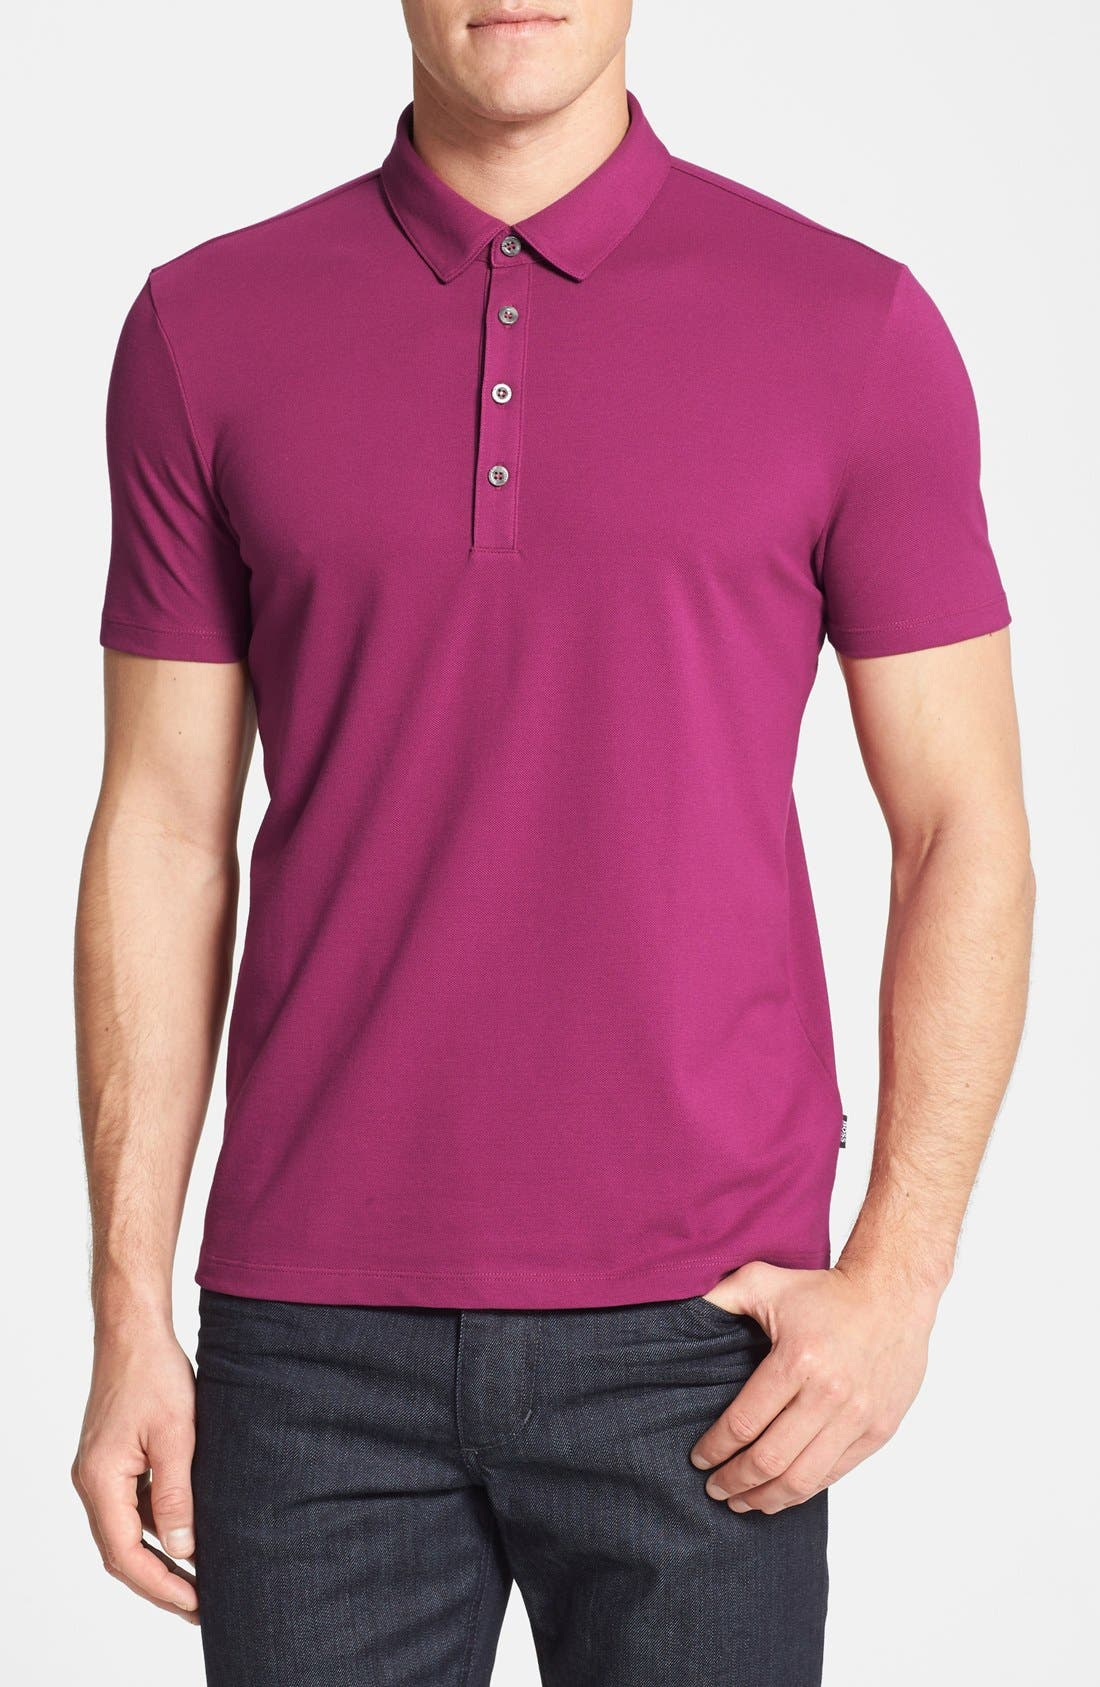 HUGO BOSS 'Firenze 43' Regular Fit Jersey Polo,                             Main thumbnail 1, color,                             Berry